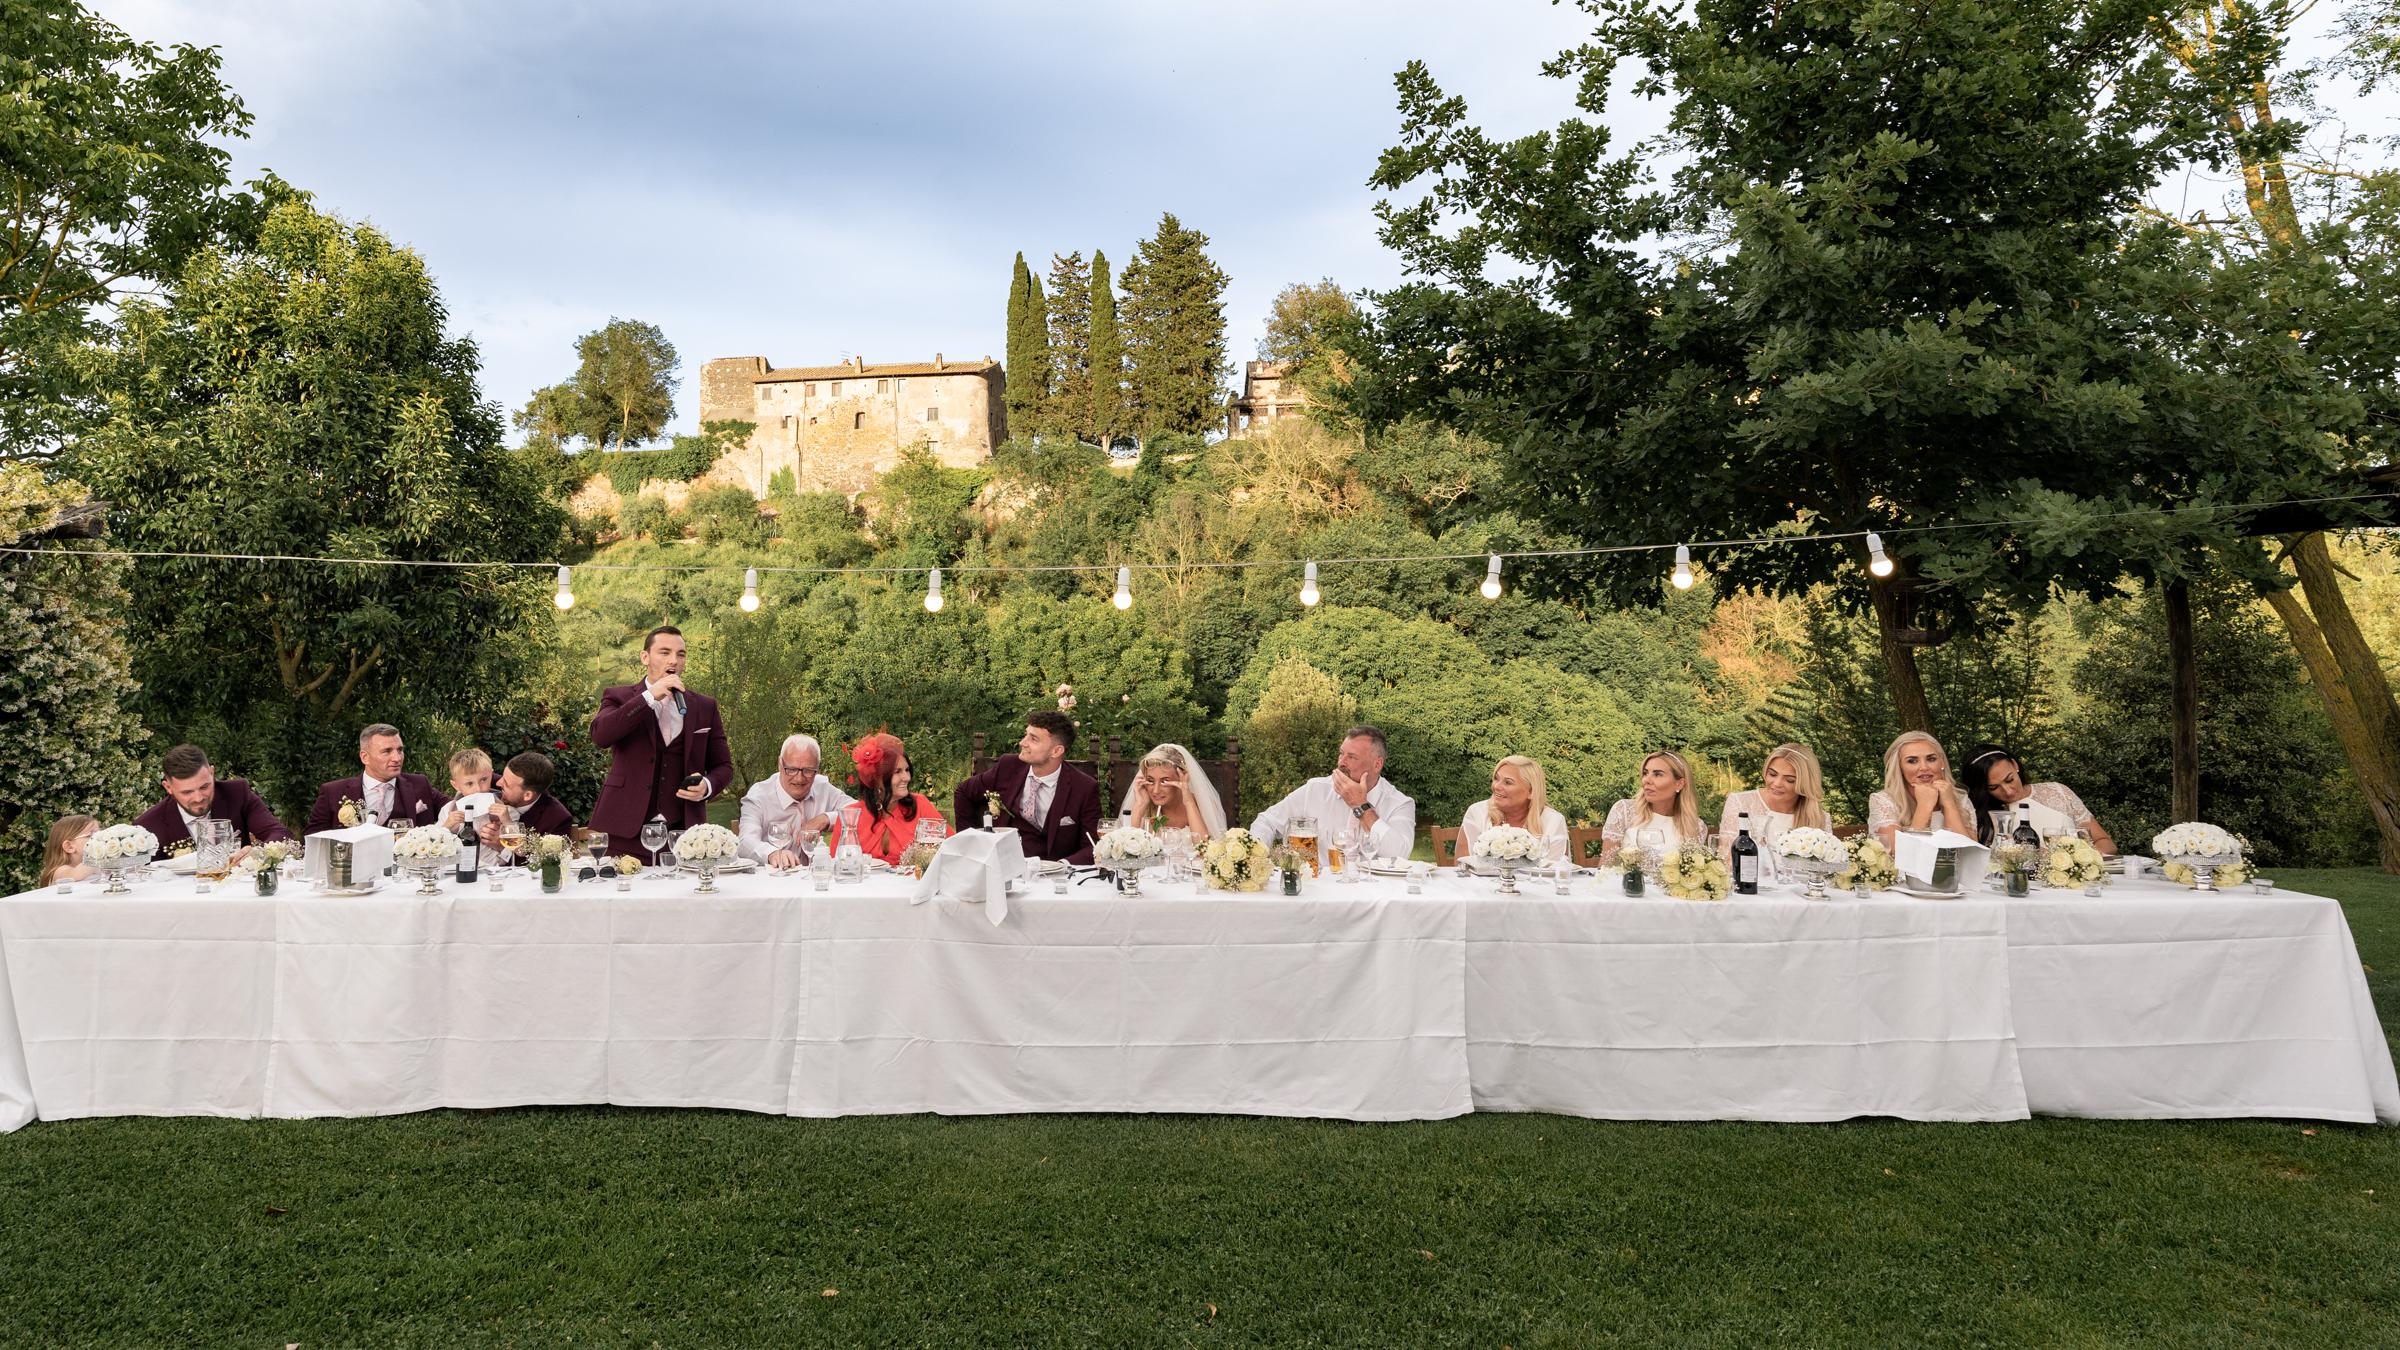 Borgo di tragliata Wedding-34.jpg